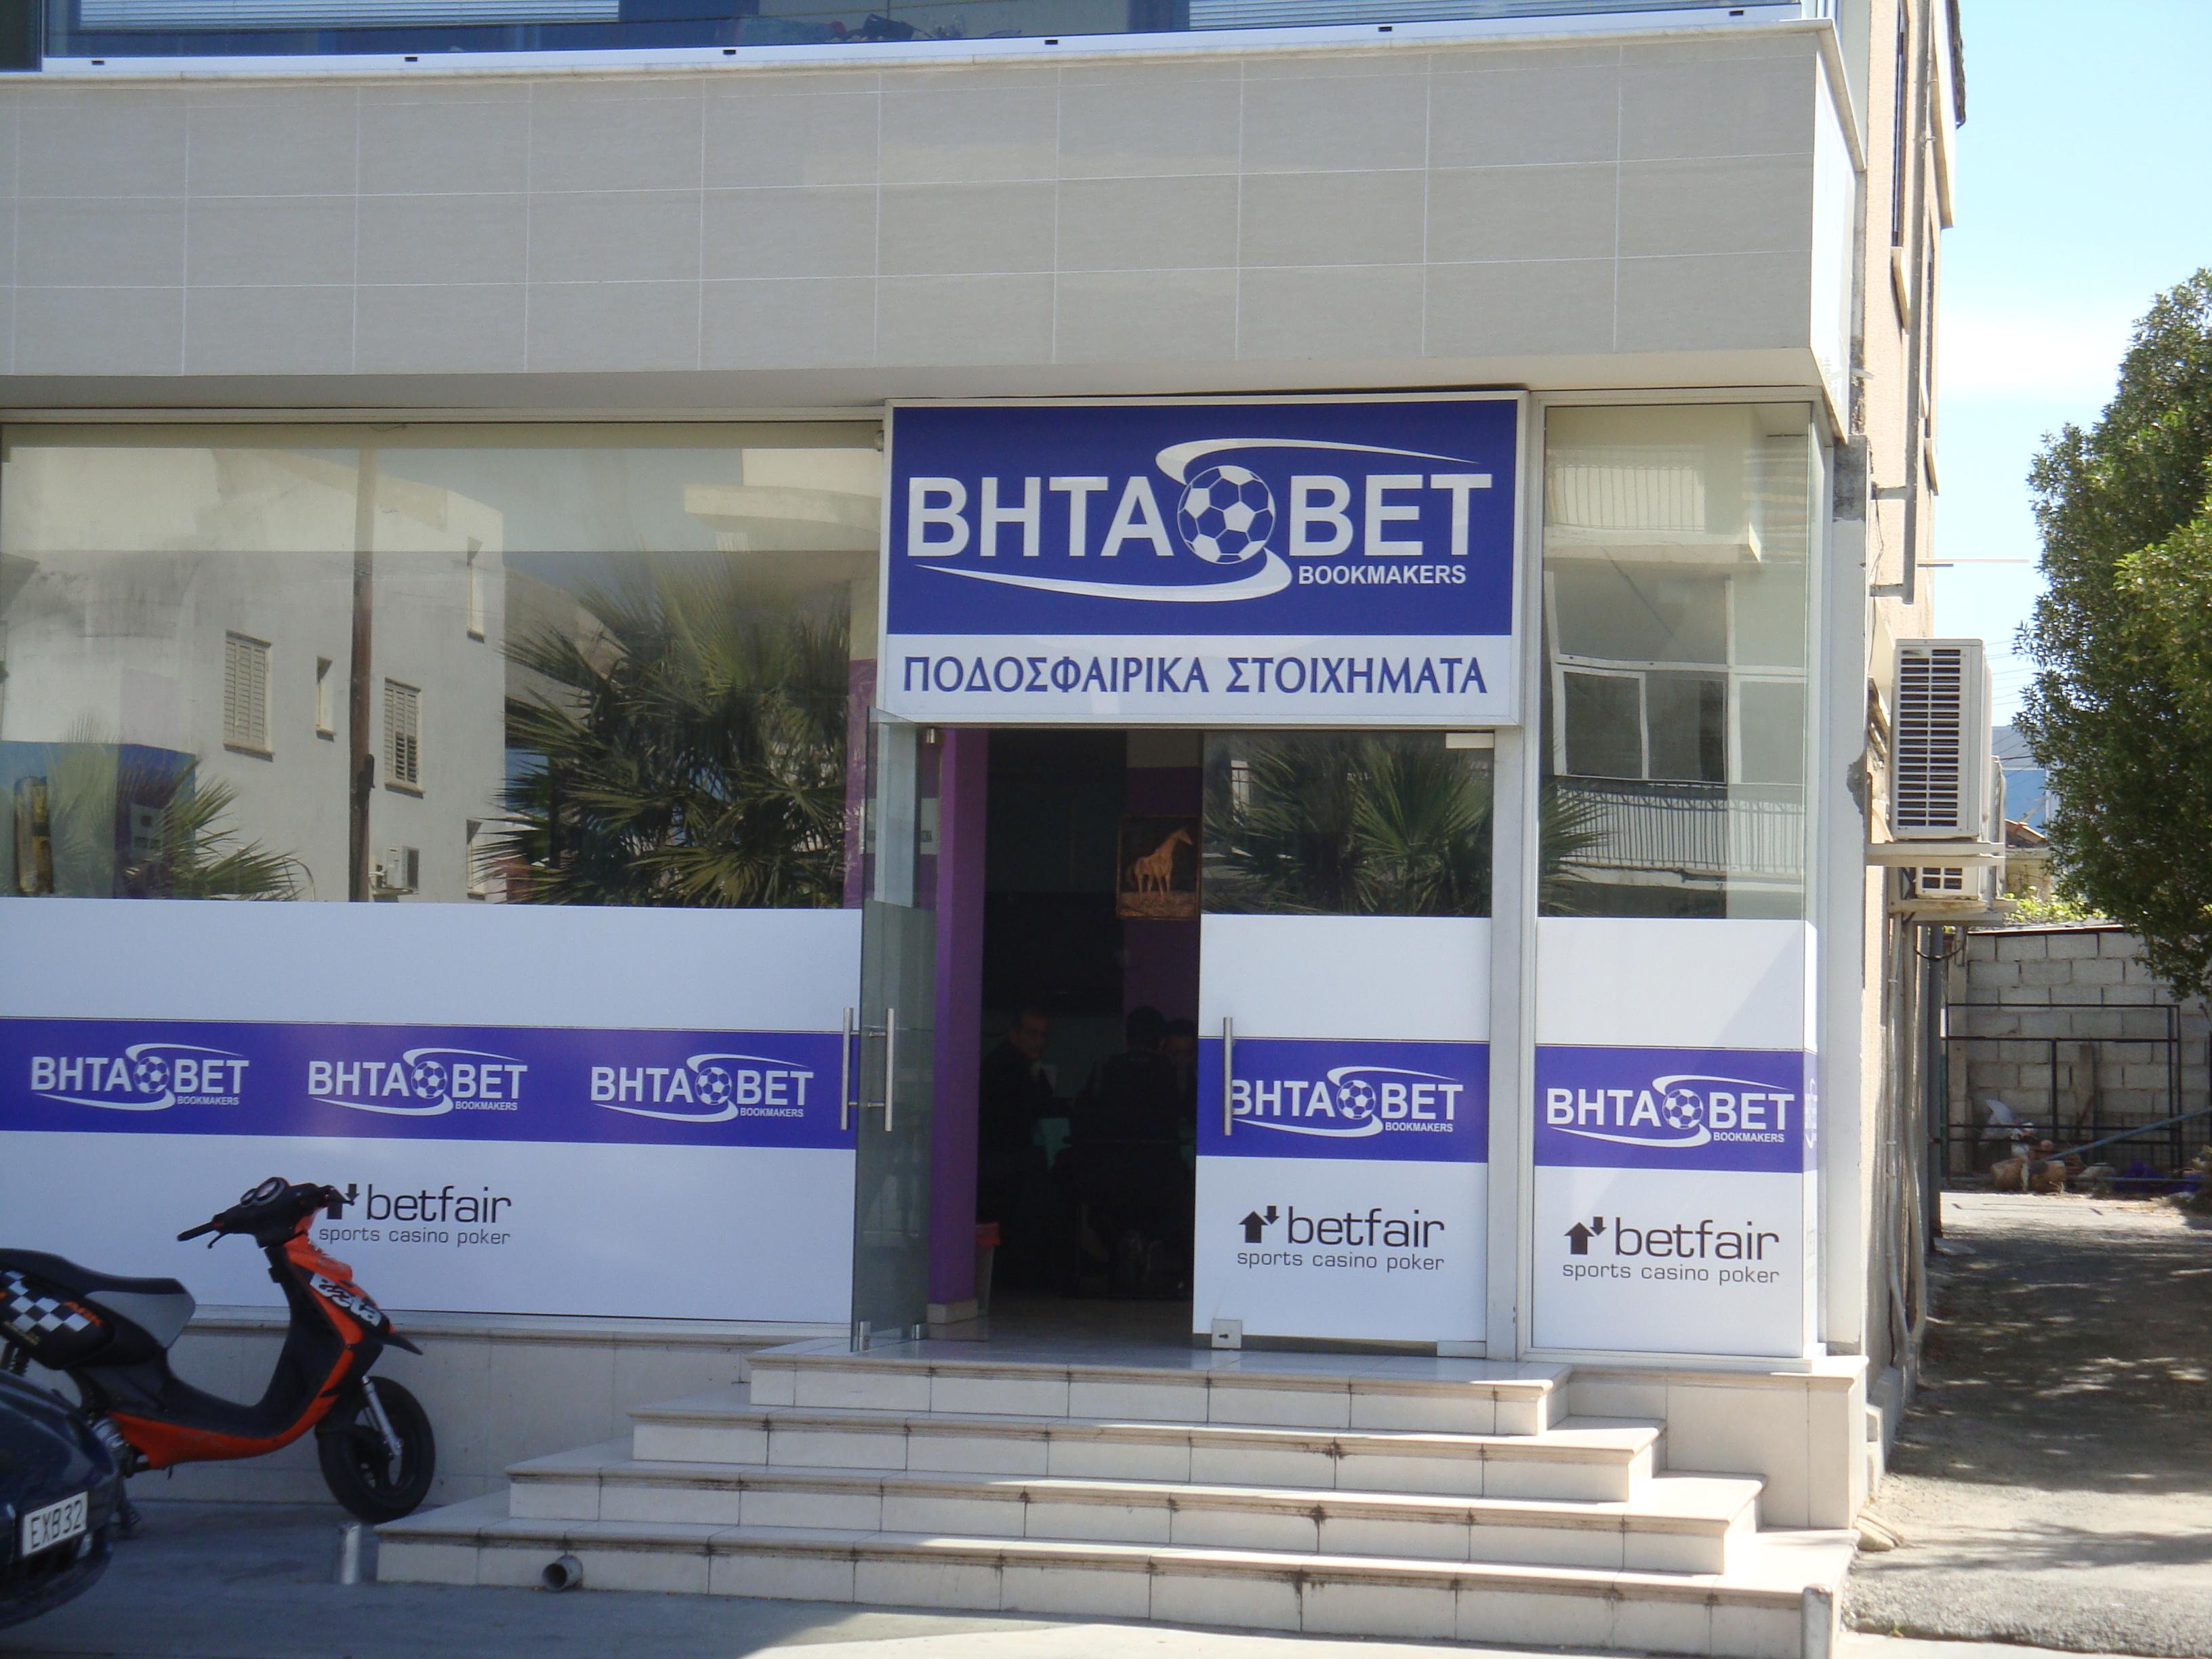 Bhtabet nicosia betting bears vs lions betting line 2021 electoral votes